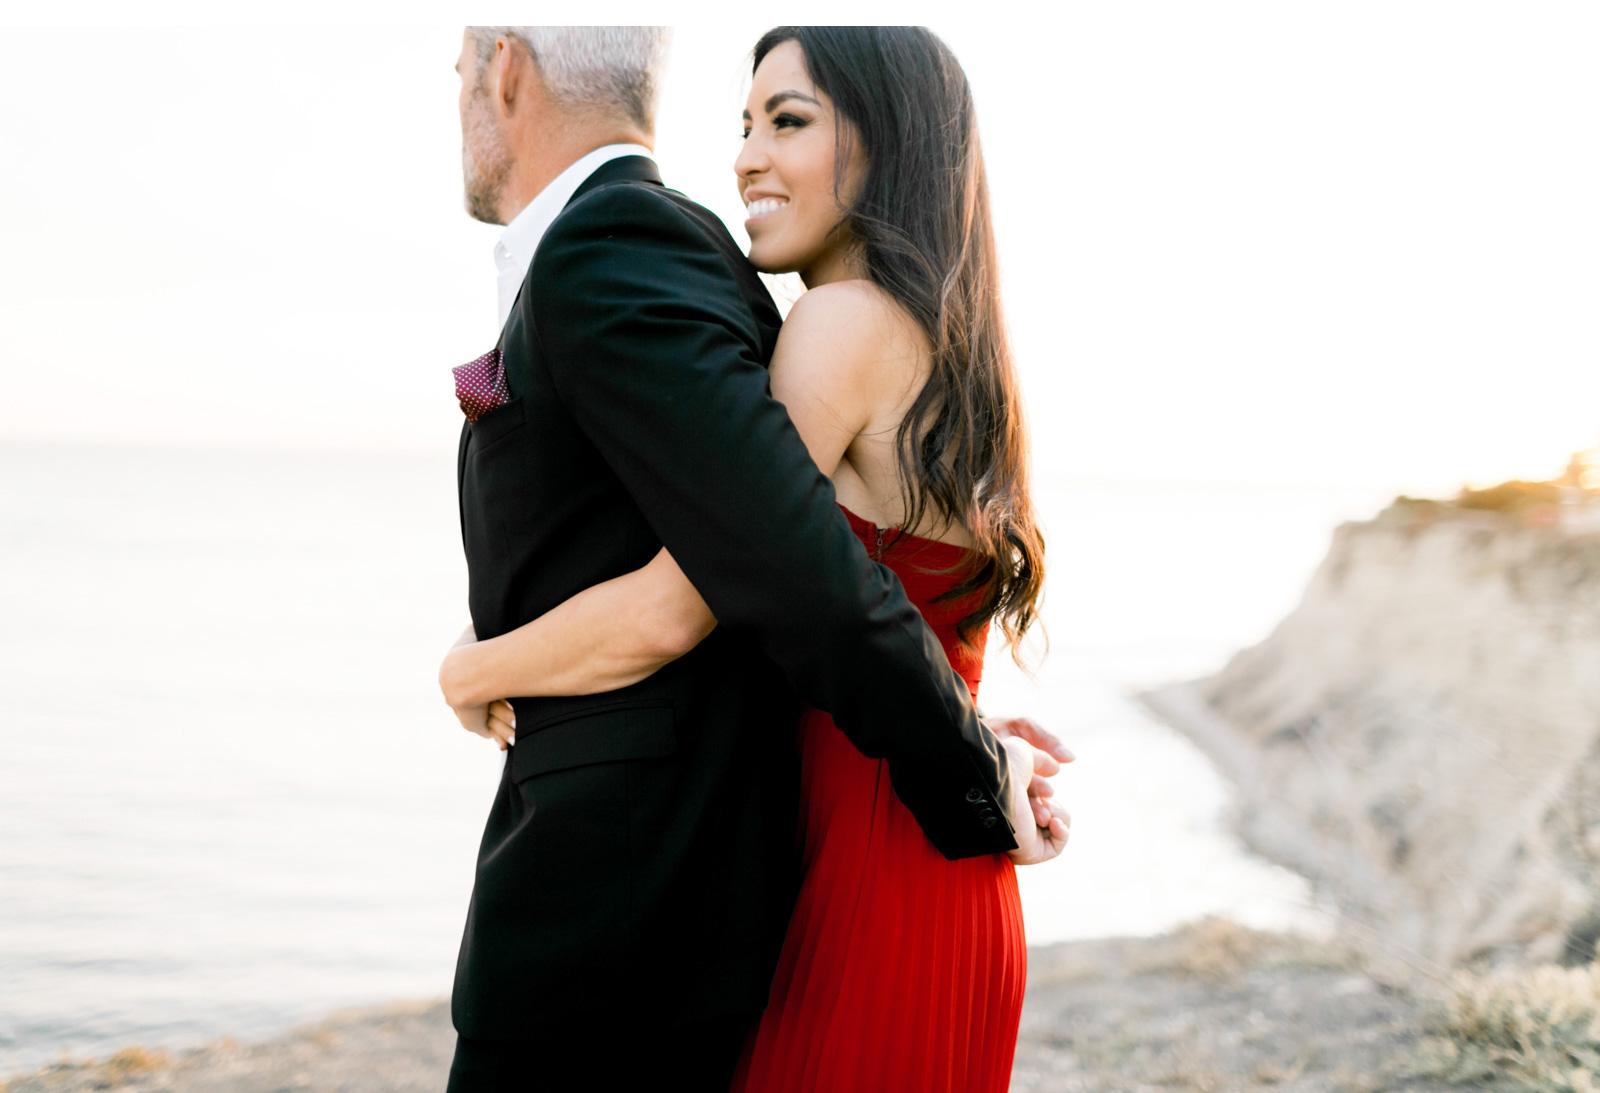 San-Luis-Obispo-Wedding-Photographer-Natalie-Schutt-Photography_05.jpg